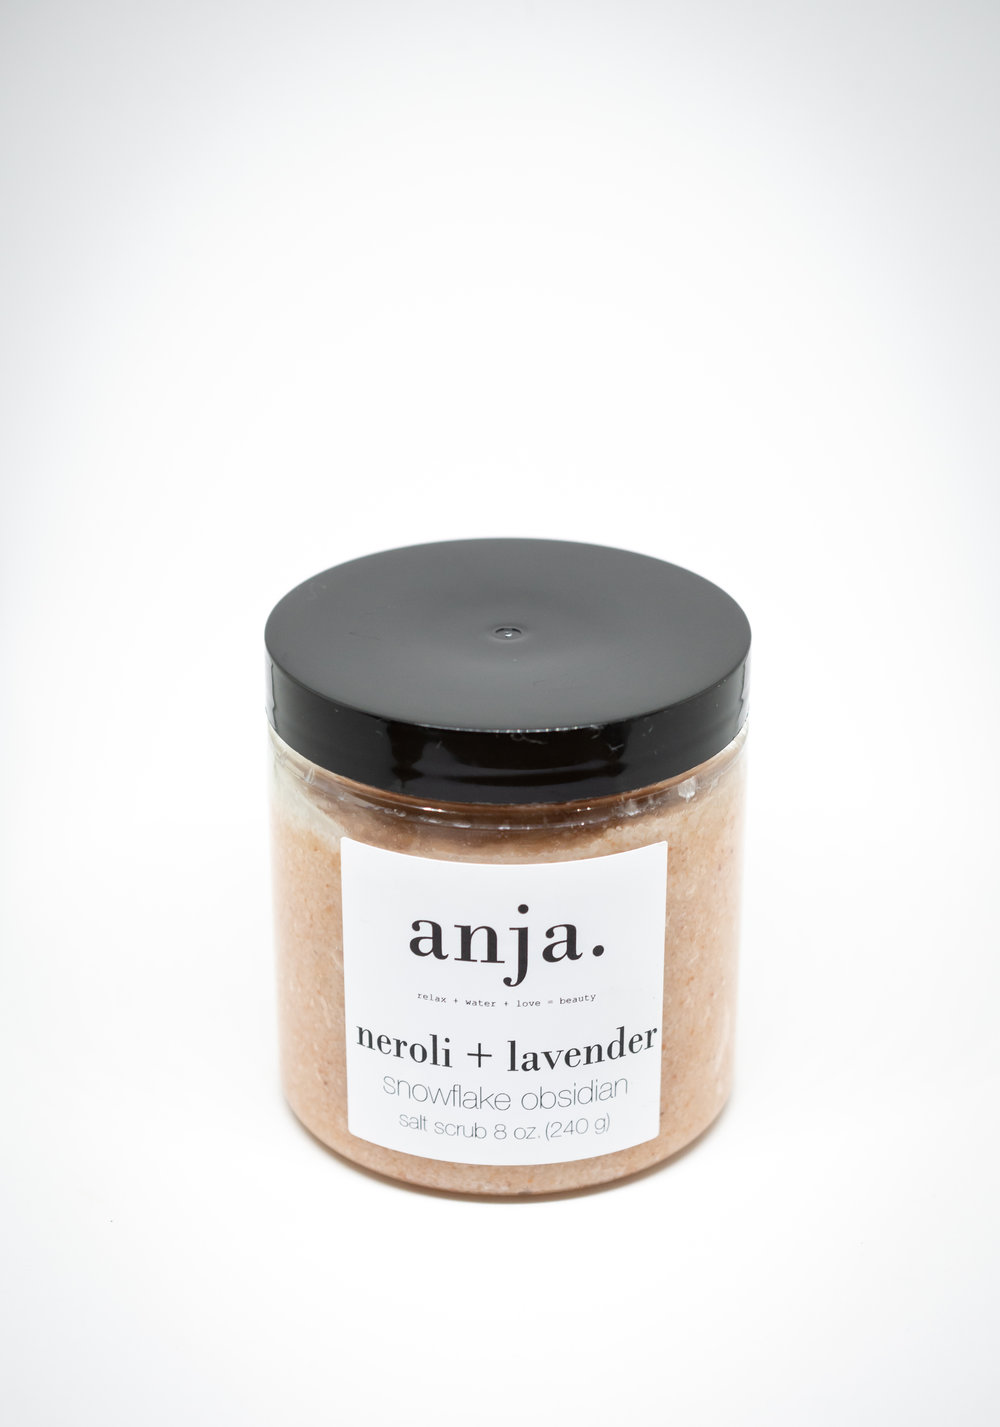 neroli + lavender snowflake obsidean salt scrub $30